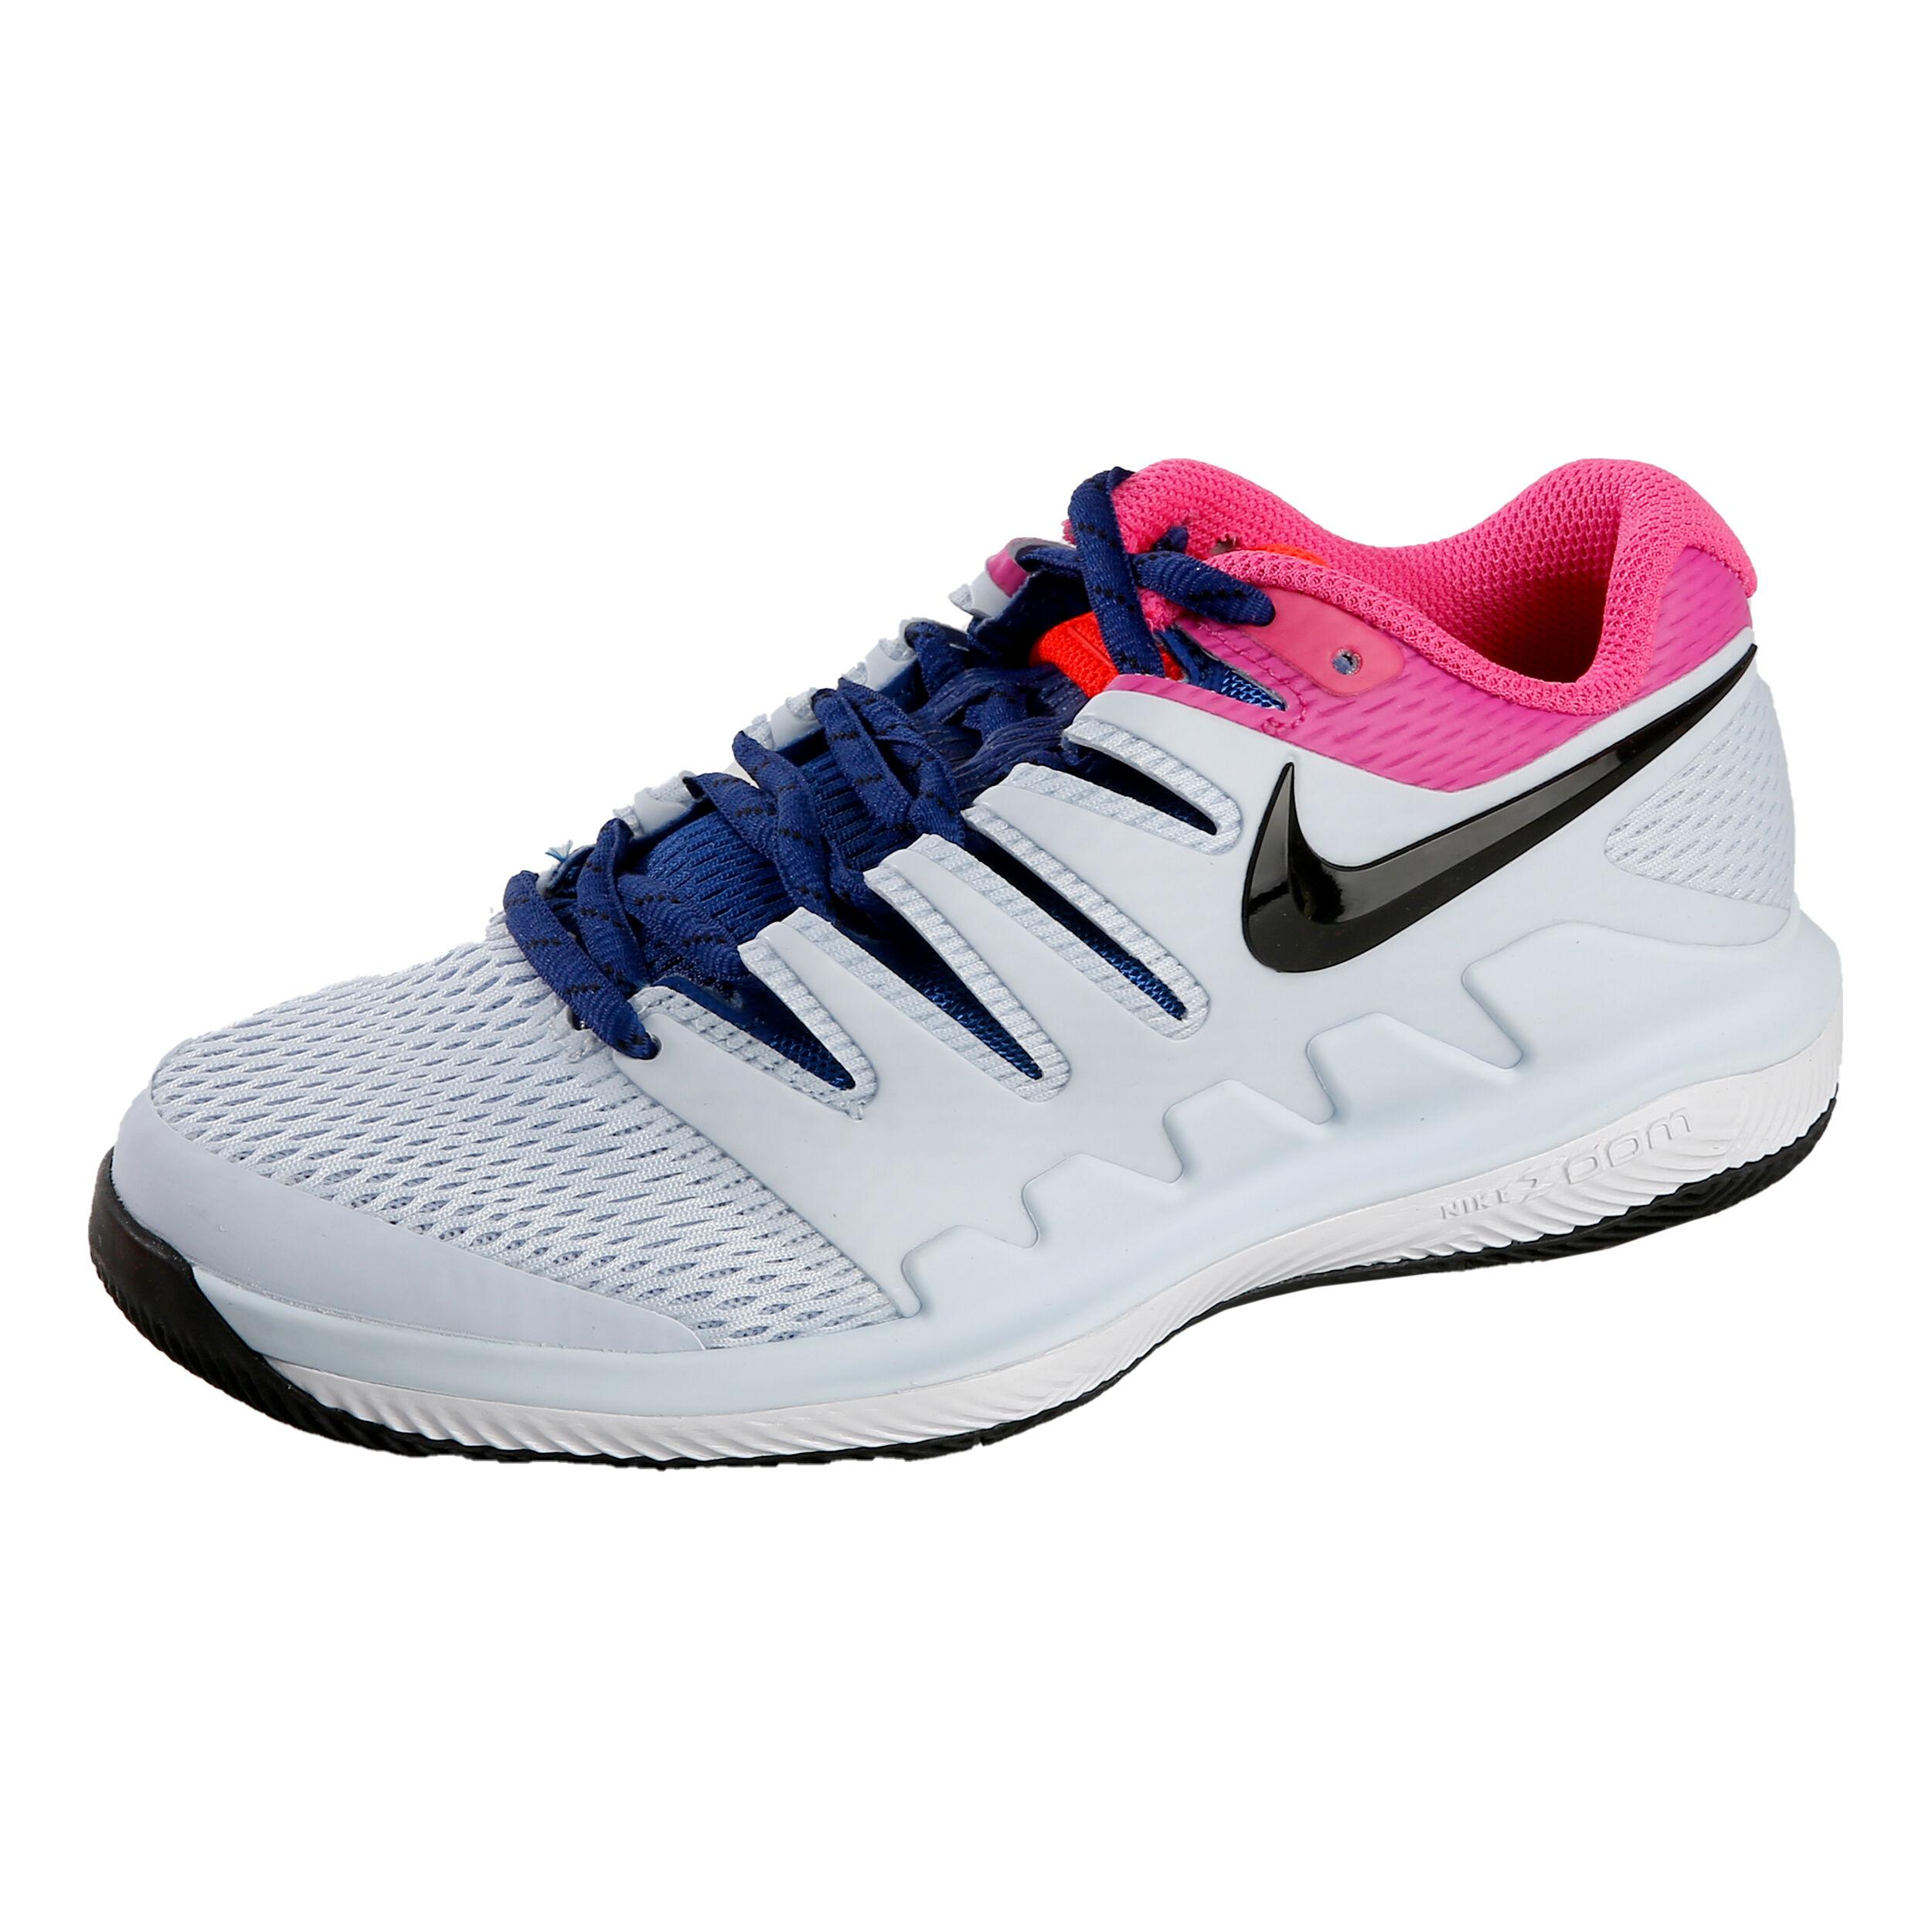 buy Nike Air Zoom Vapor X All Court Shoe Kids - Light Blue, Blue ...